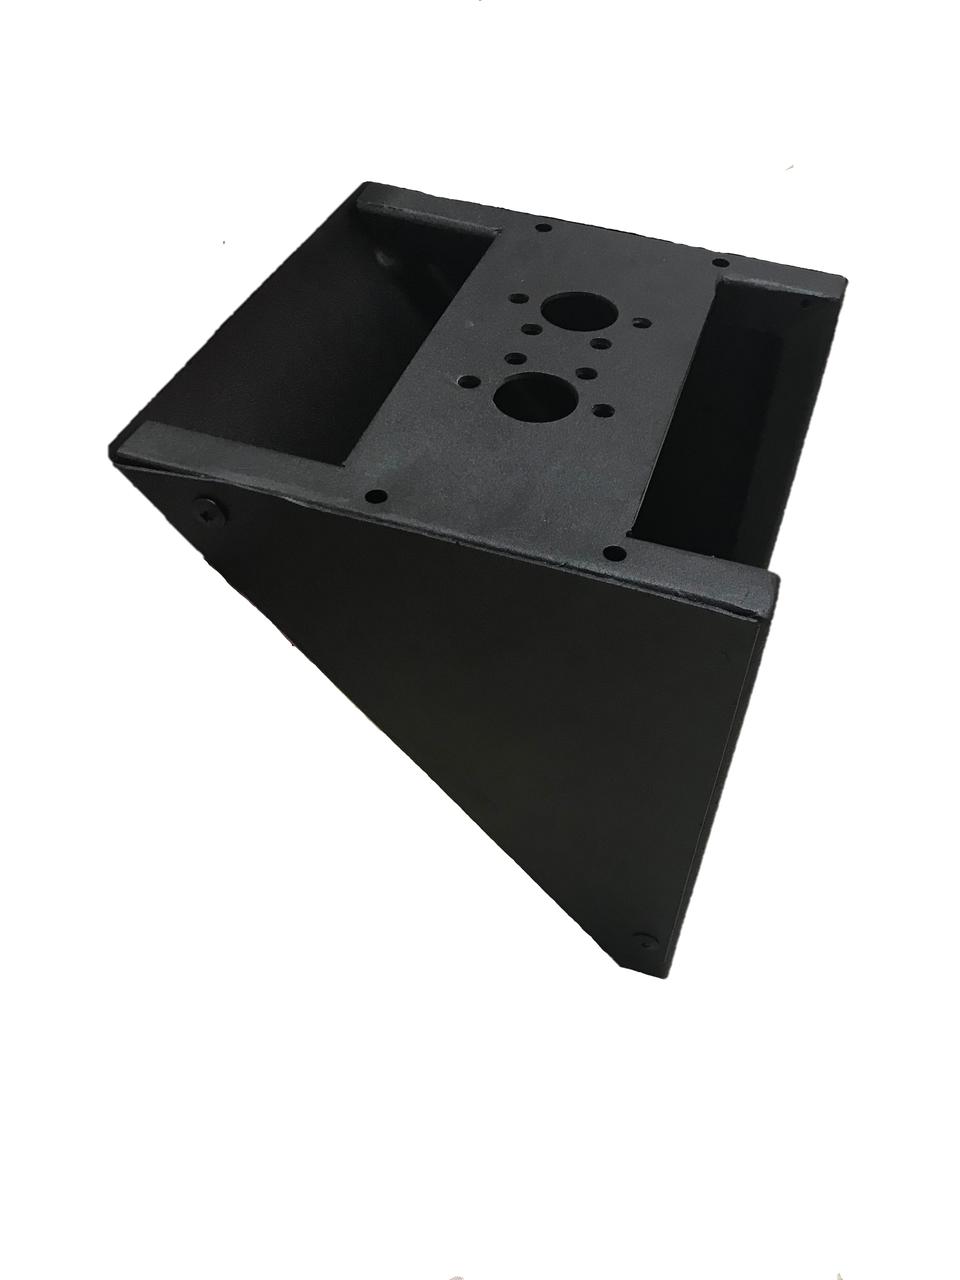 Кронштейн настенный для Планар 2д, 4дм2, 44д - фото 1